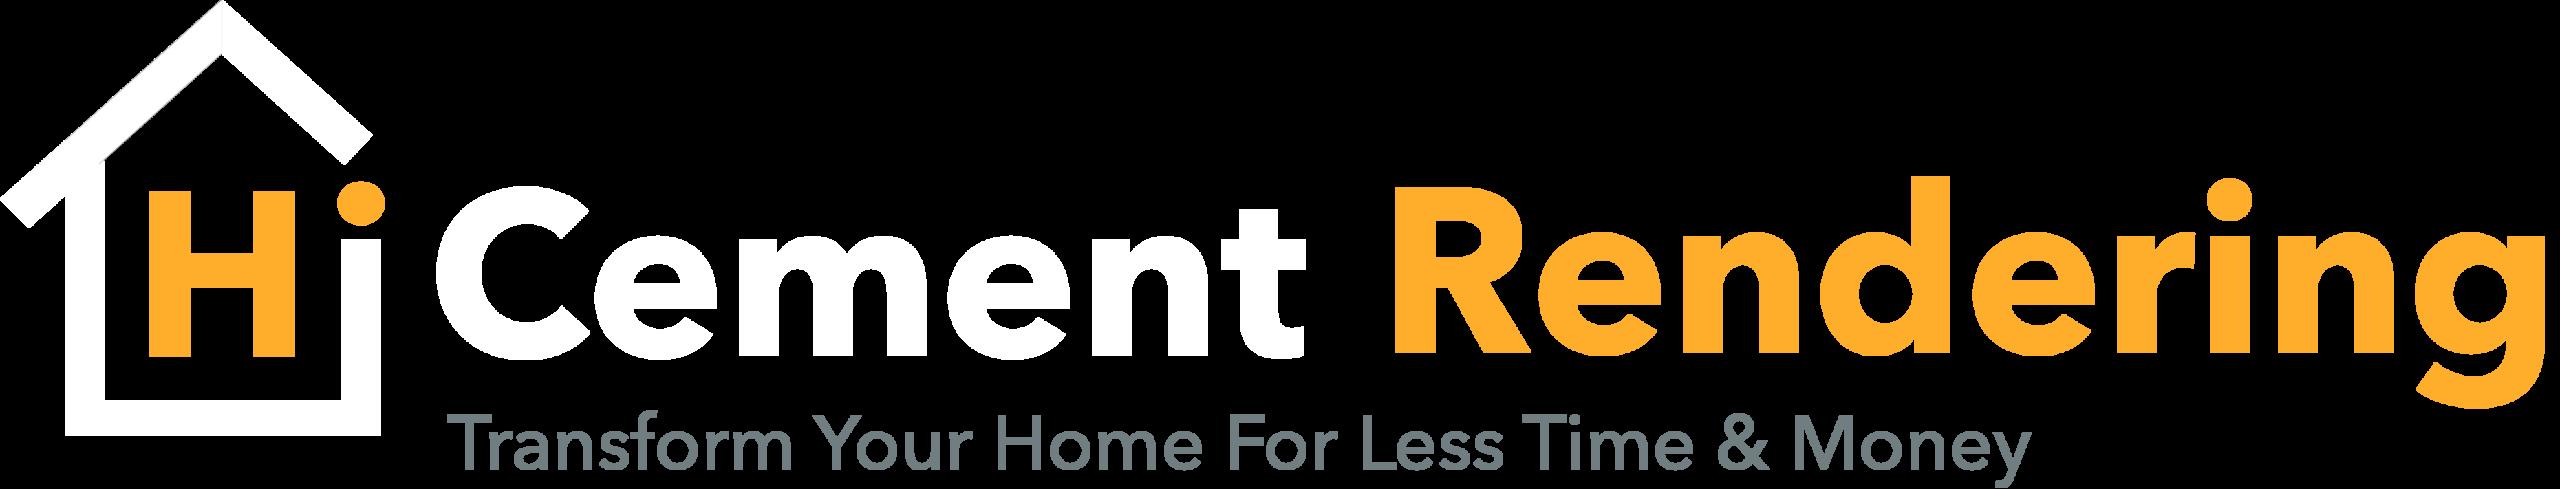 Logo Hi cement 2